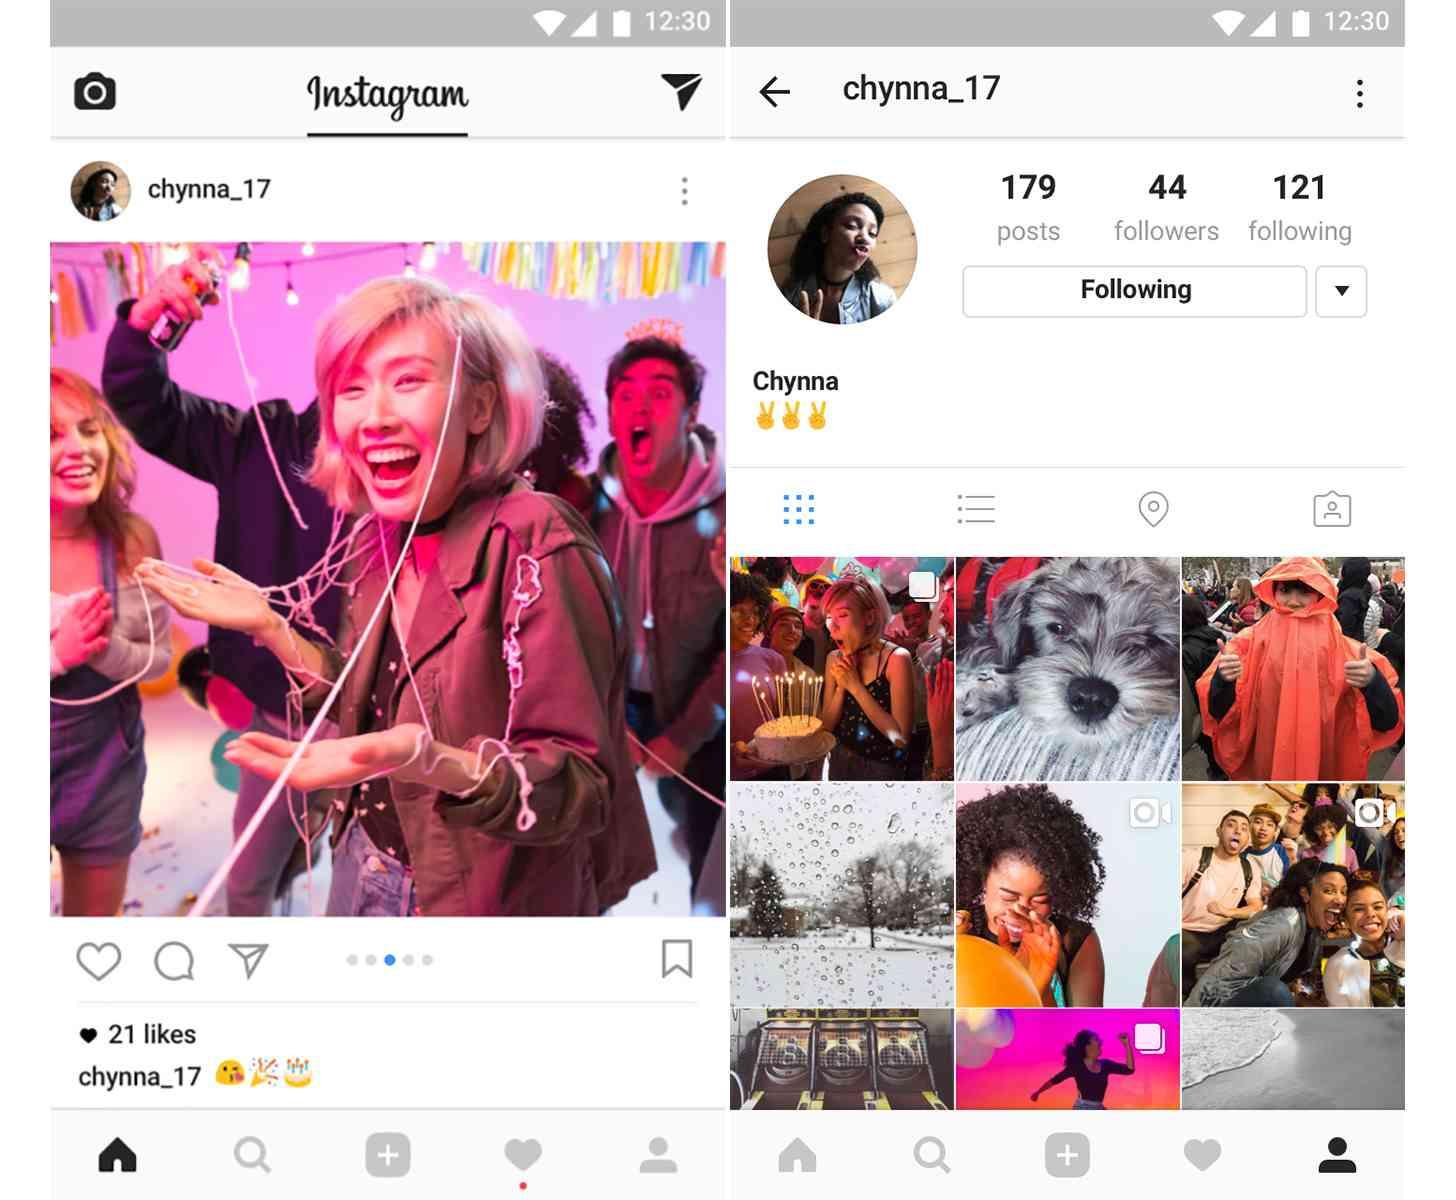 Instagram multi-photo posts feed